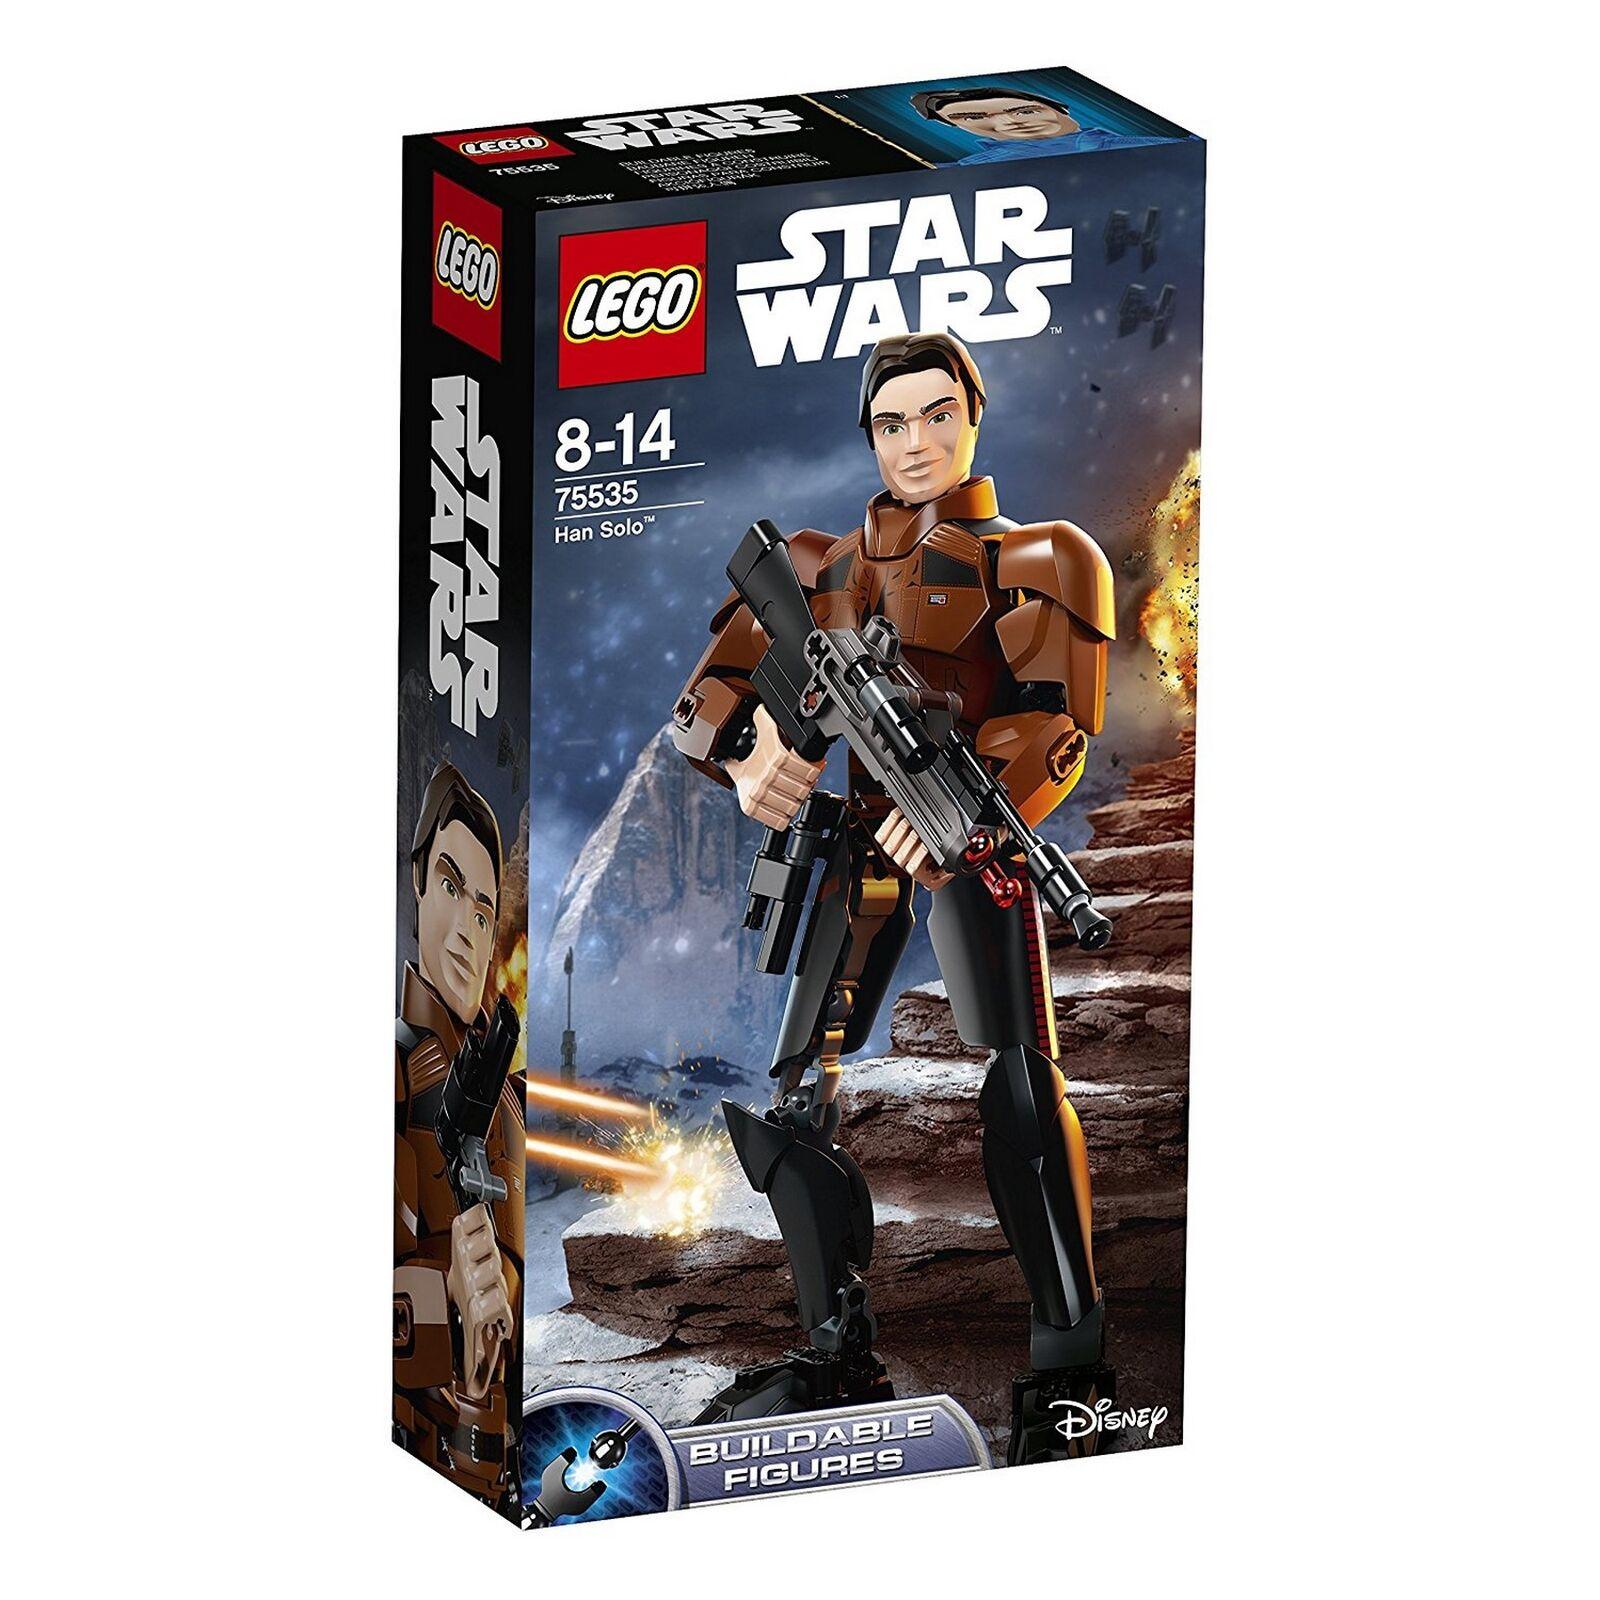 LEGO 75535 - Star Wars - Han Solo, baubare Figur